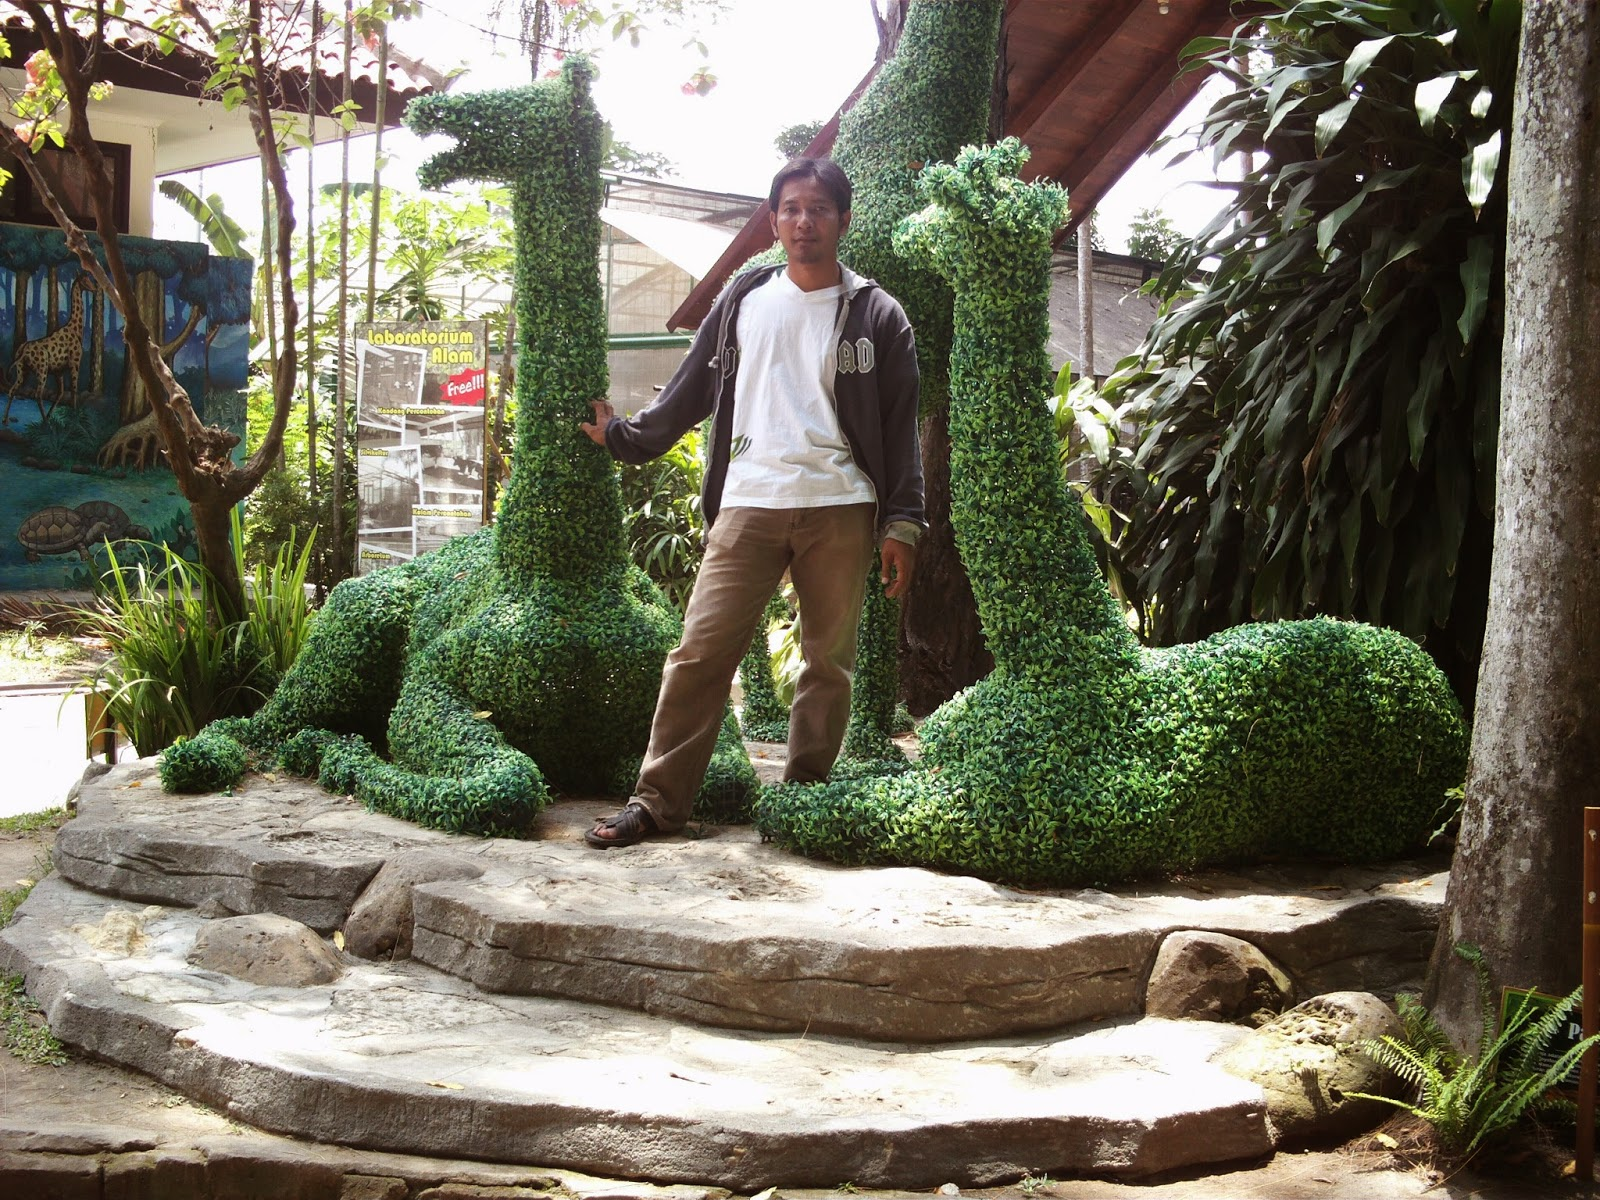 Menikmati Tempat Wisata Kebun Binatang Gembiraloka Yogyakarta Liburan Bersama Keluarga